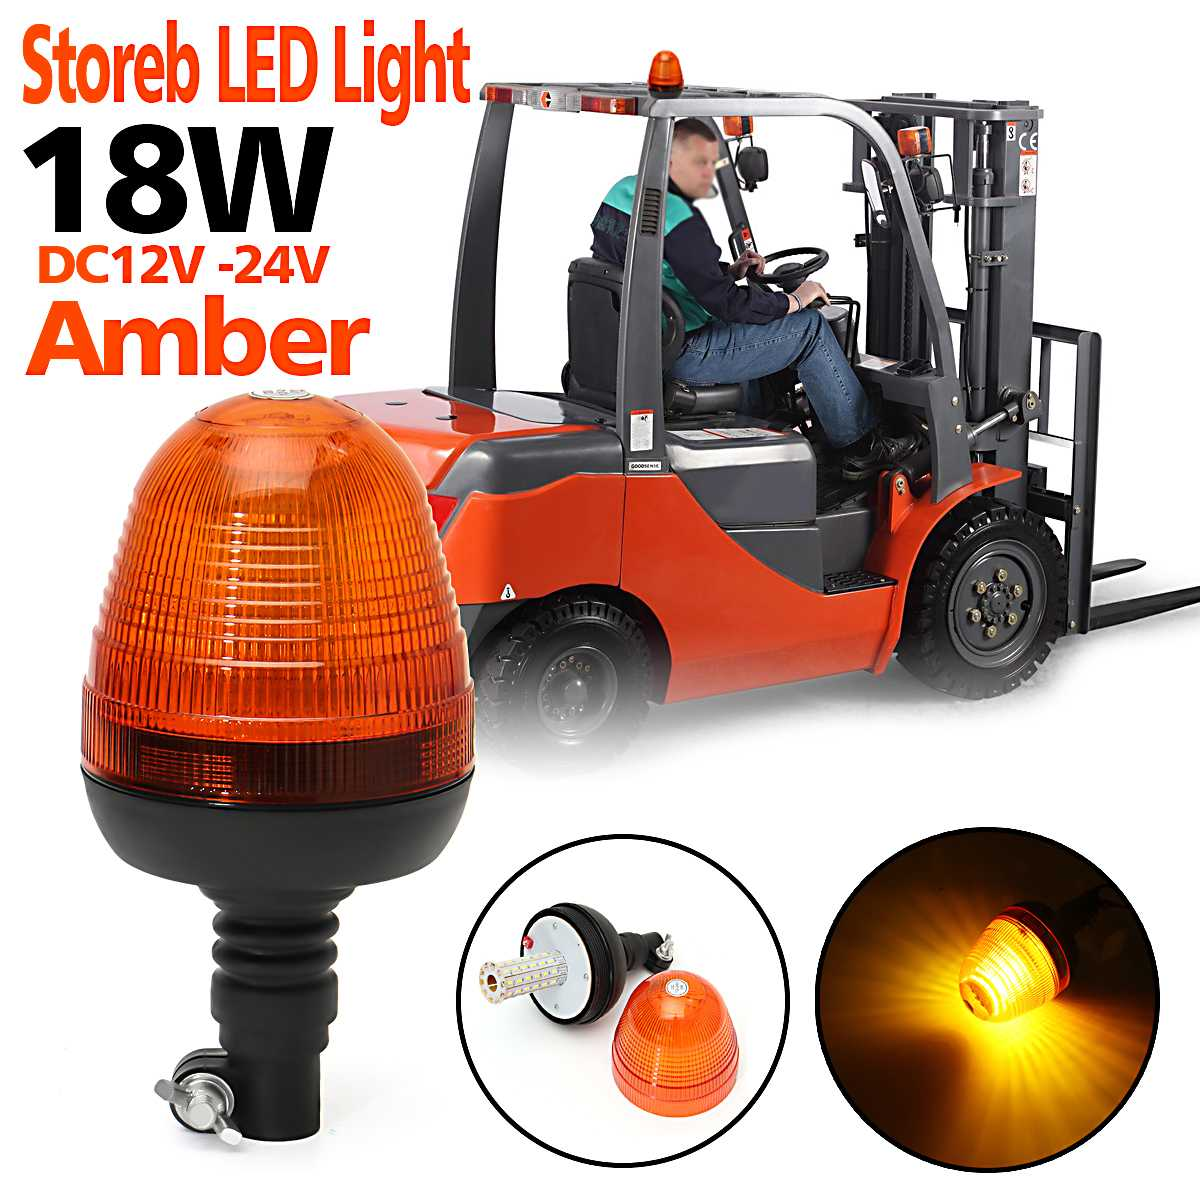 Safurance DC 12V-24V 18W Amber Forklift Car Emergency Warning Strobe Rotating LED Light Outdoor LED Strobe Flashing Alarm Lamp